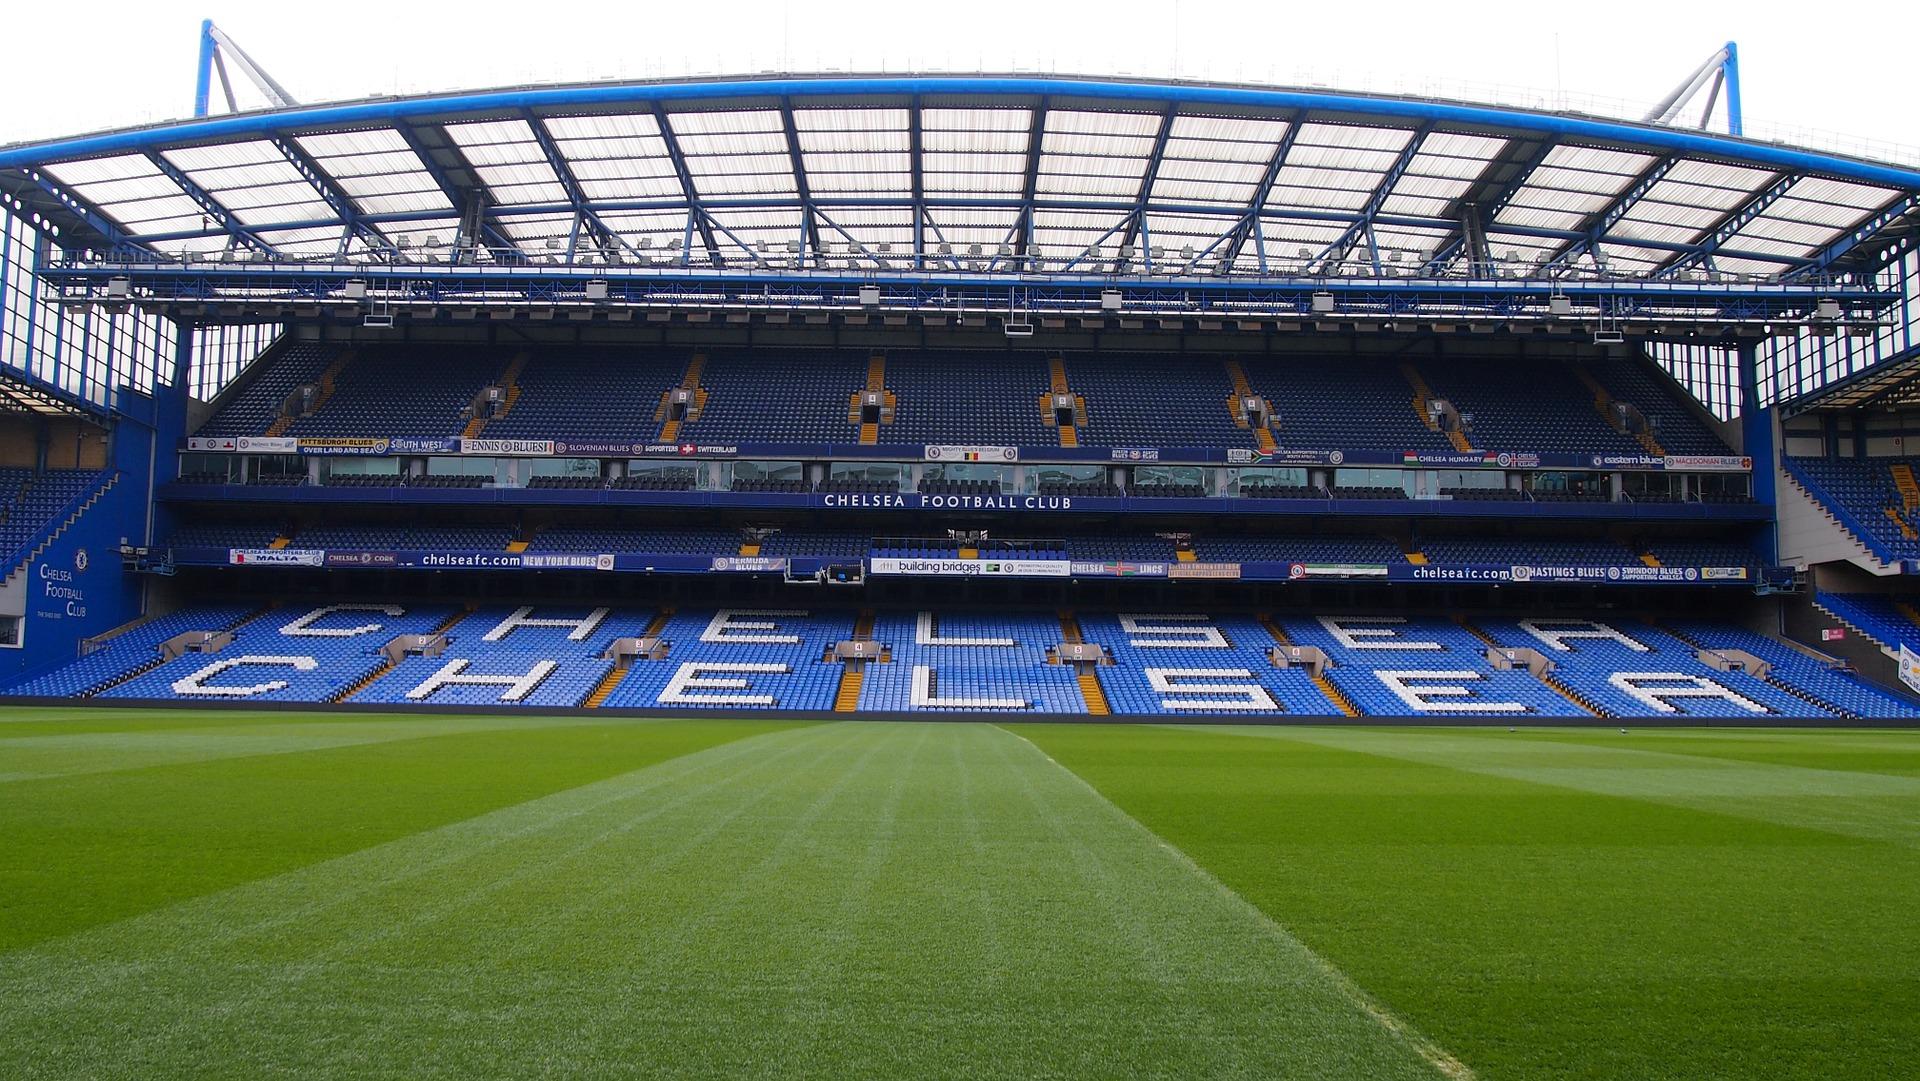 Stadion-london